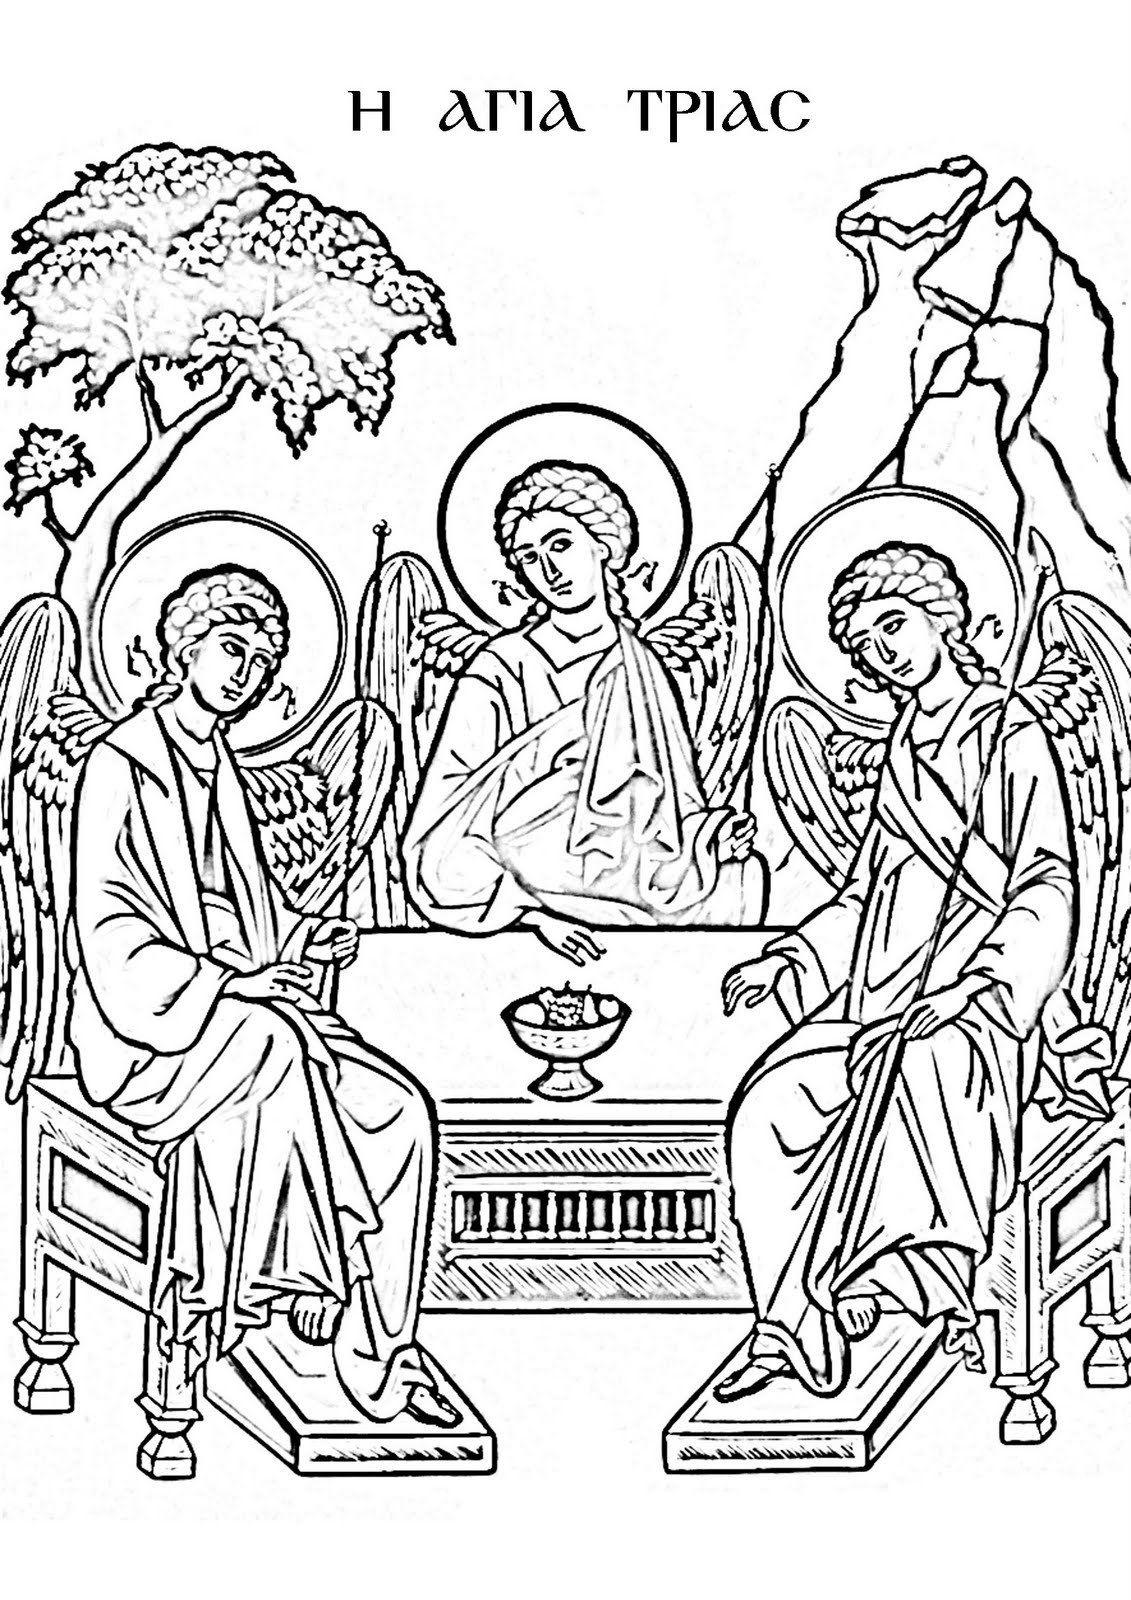 Orthodox Sunday School Resources Minion Coloring Pages Coloring Pages Christian Coloring